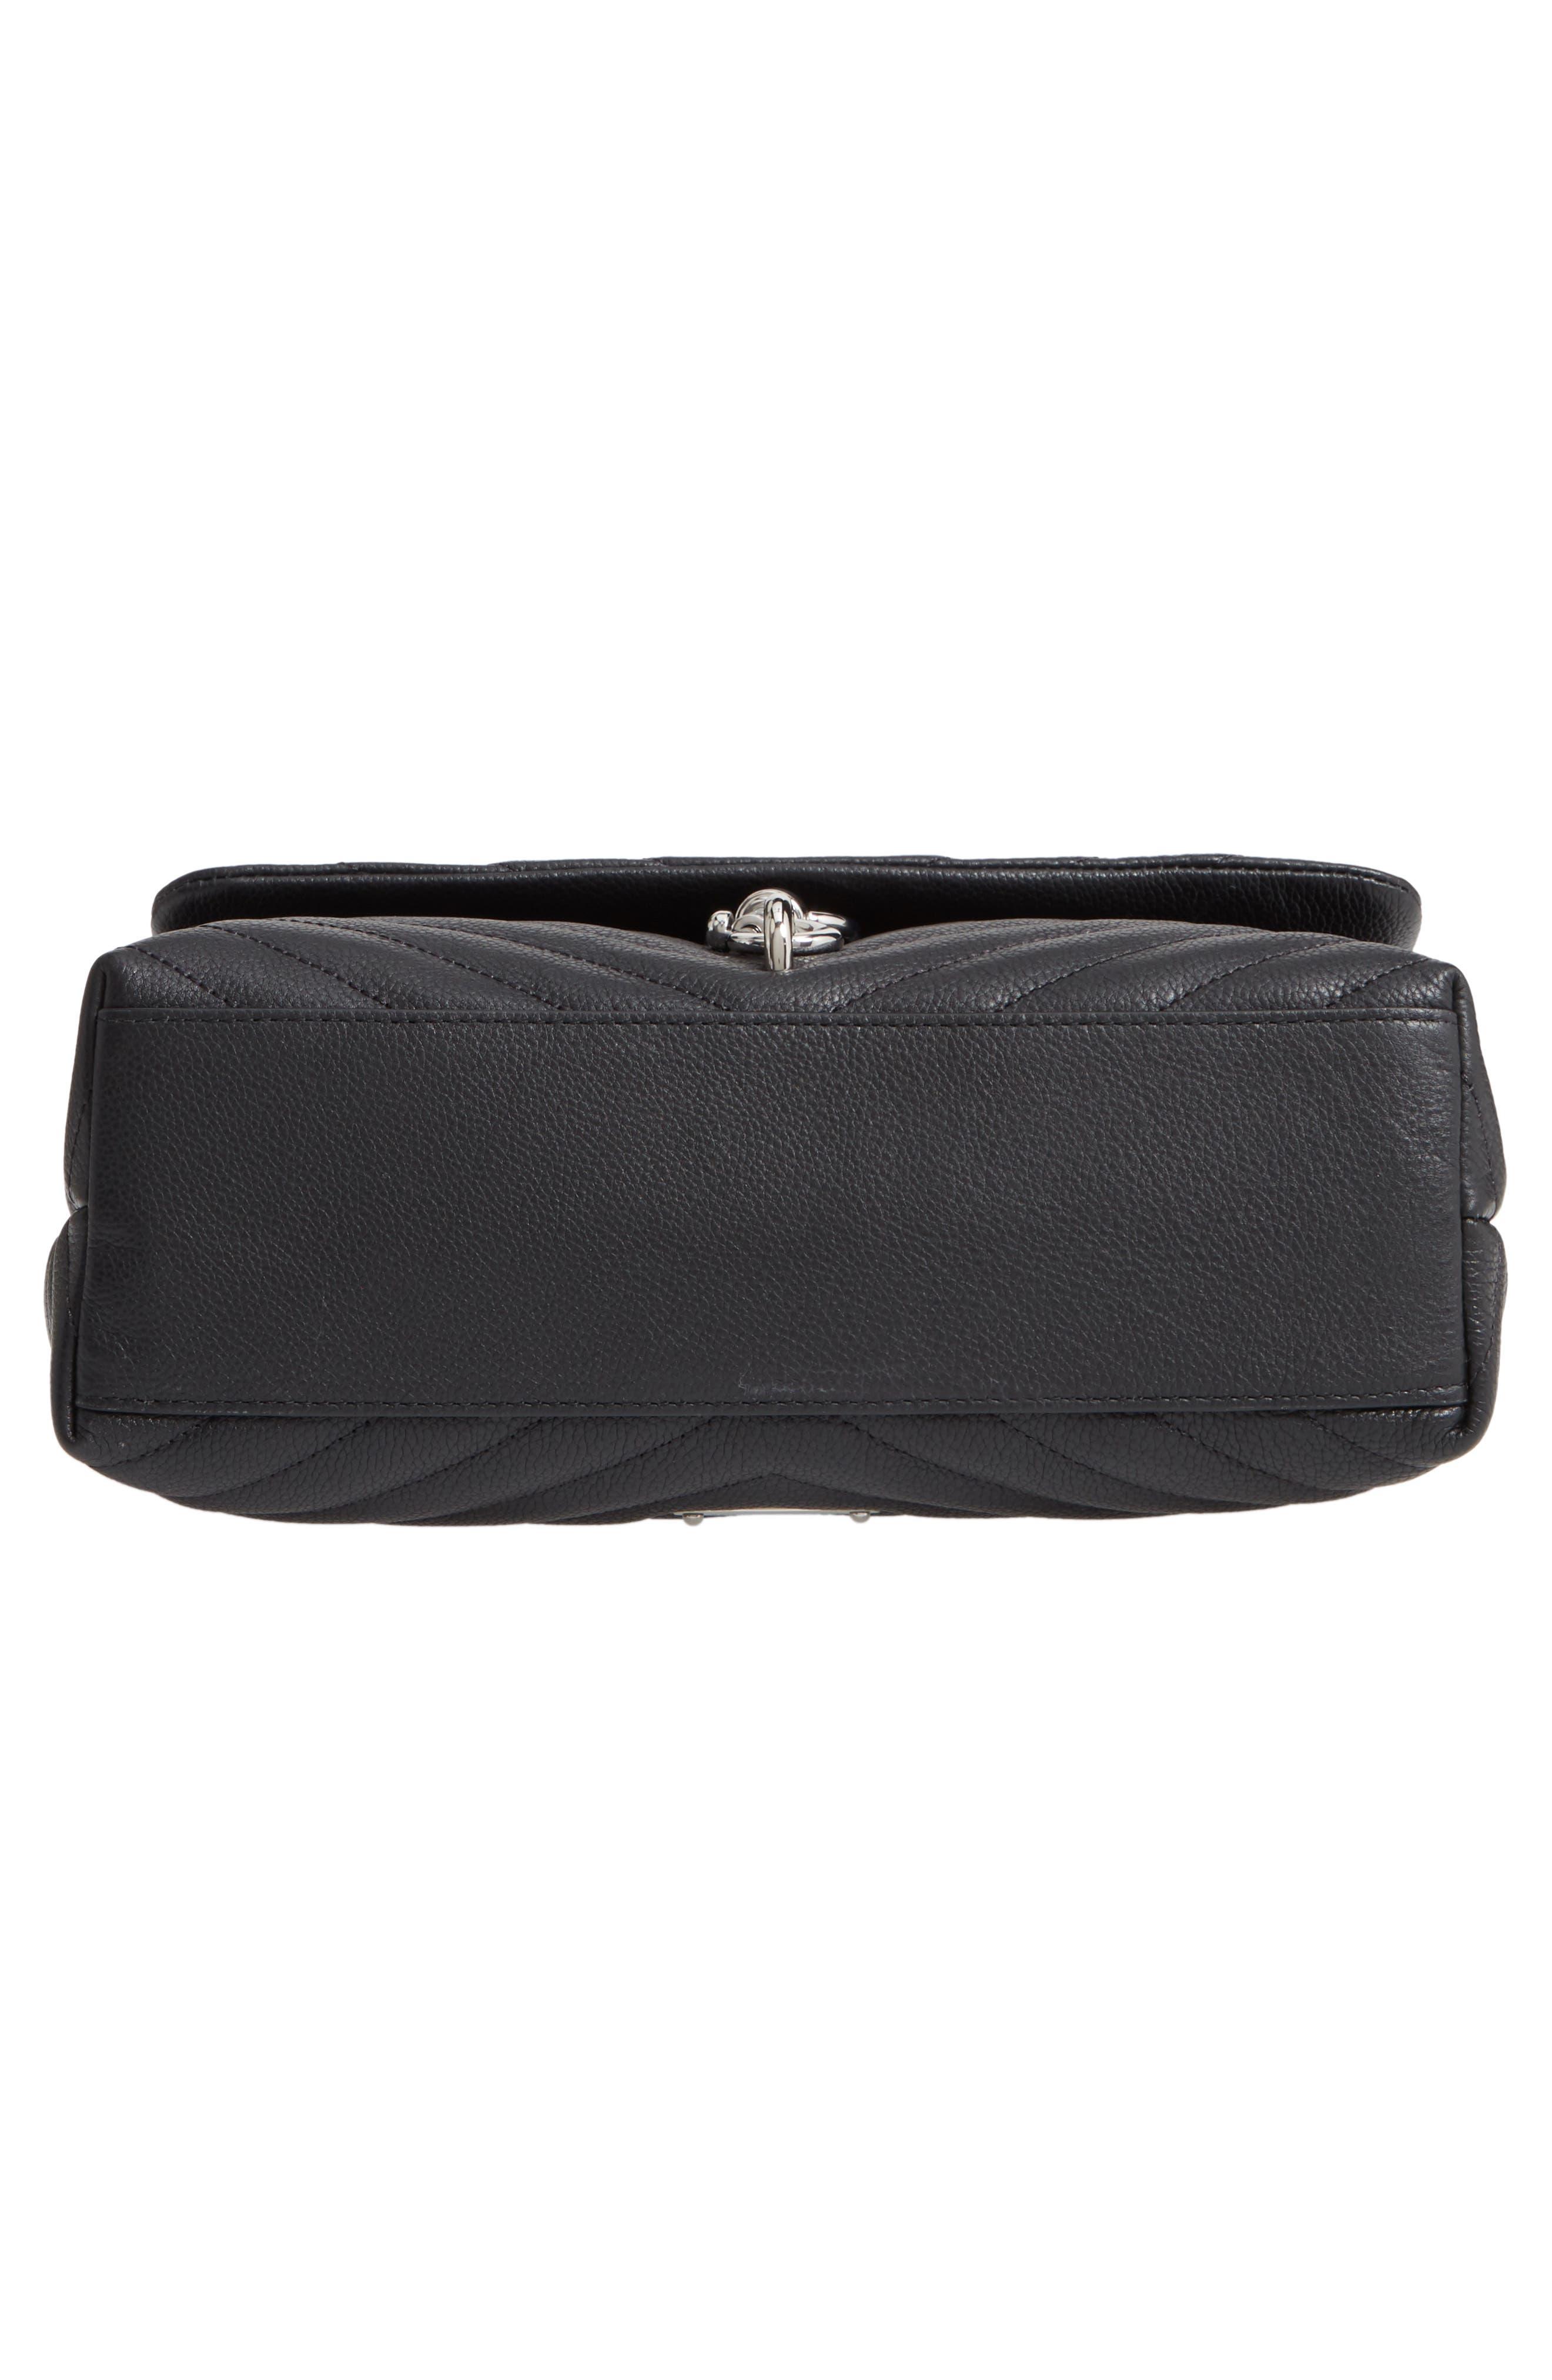 REBECCA MINKOFF, Edie Flap Quilted Leather Shoulder Bag, Alternate thumbnail 7, color, BLACK